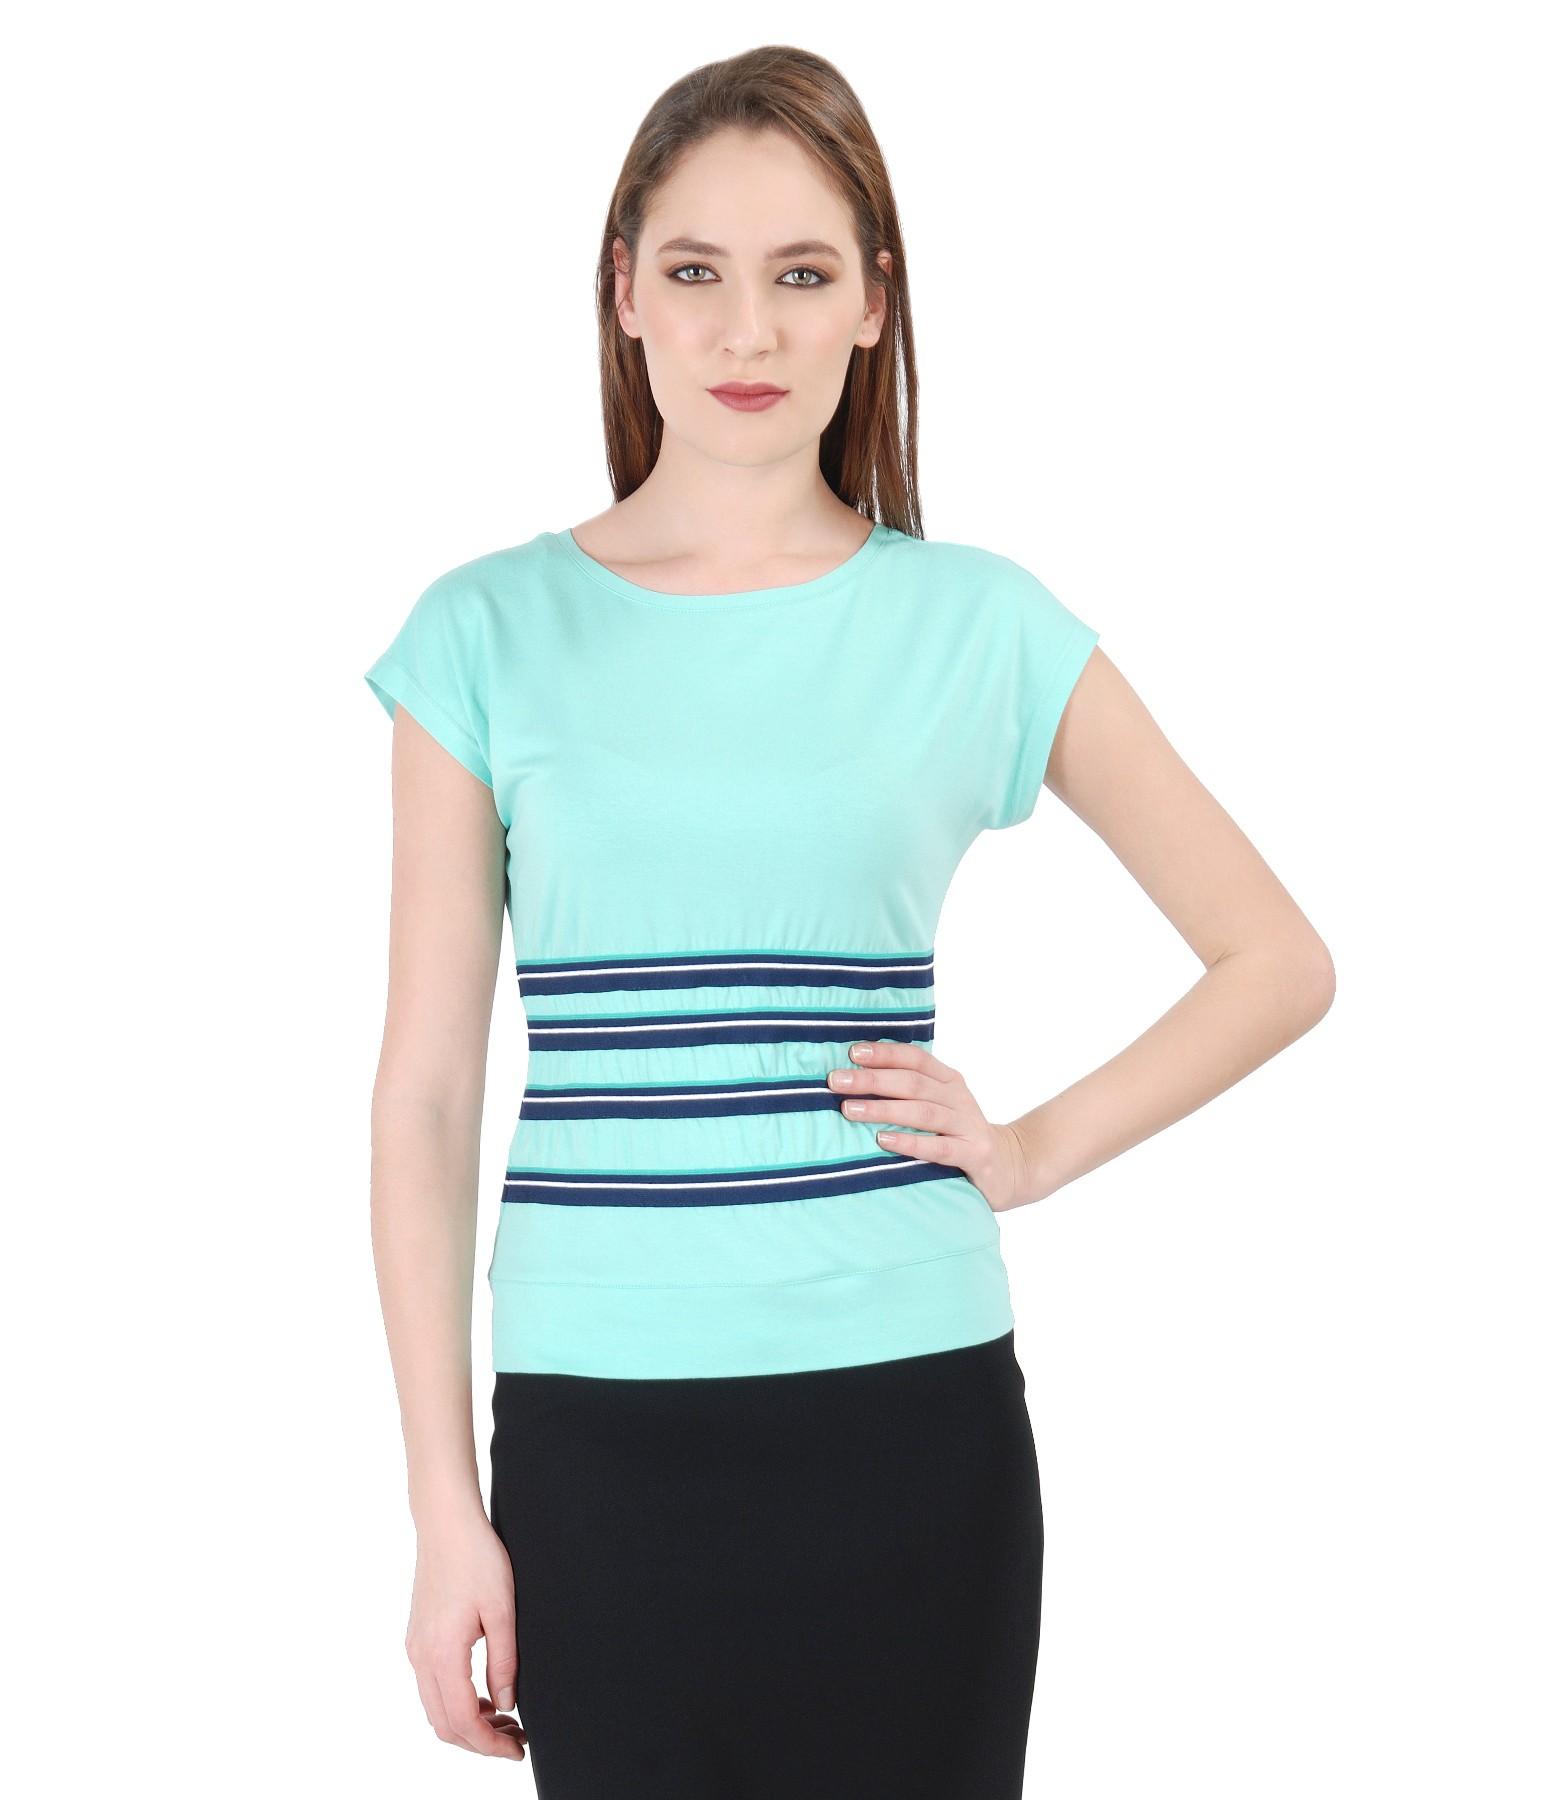 67256dc9144 Uni jersey t-shirt with elastic waist mint green - YOKKO